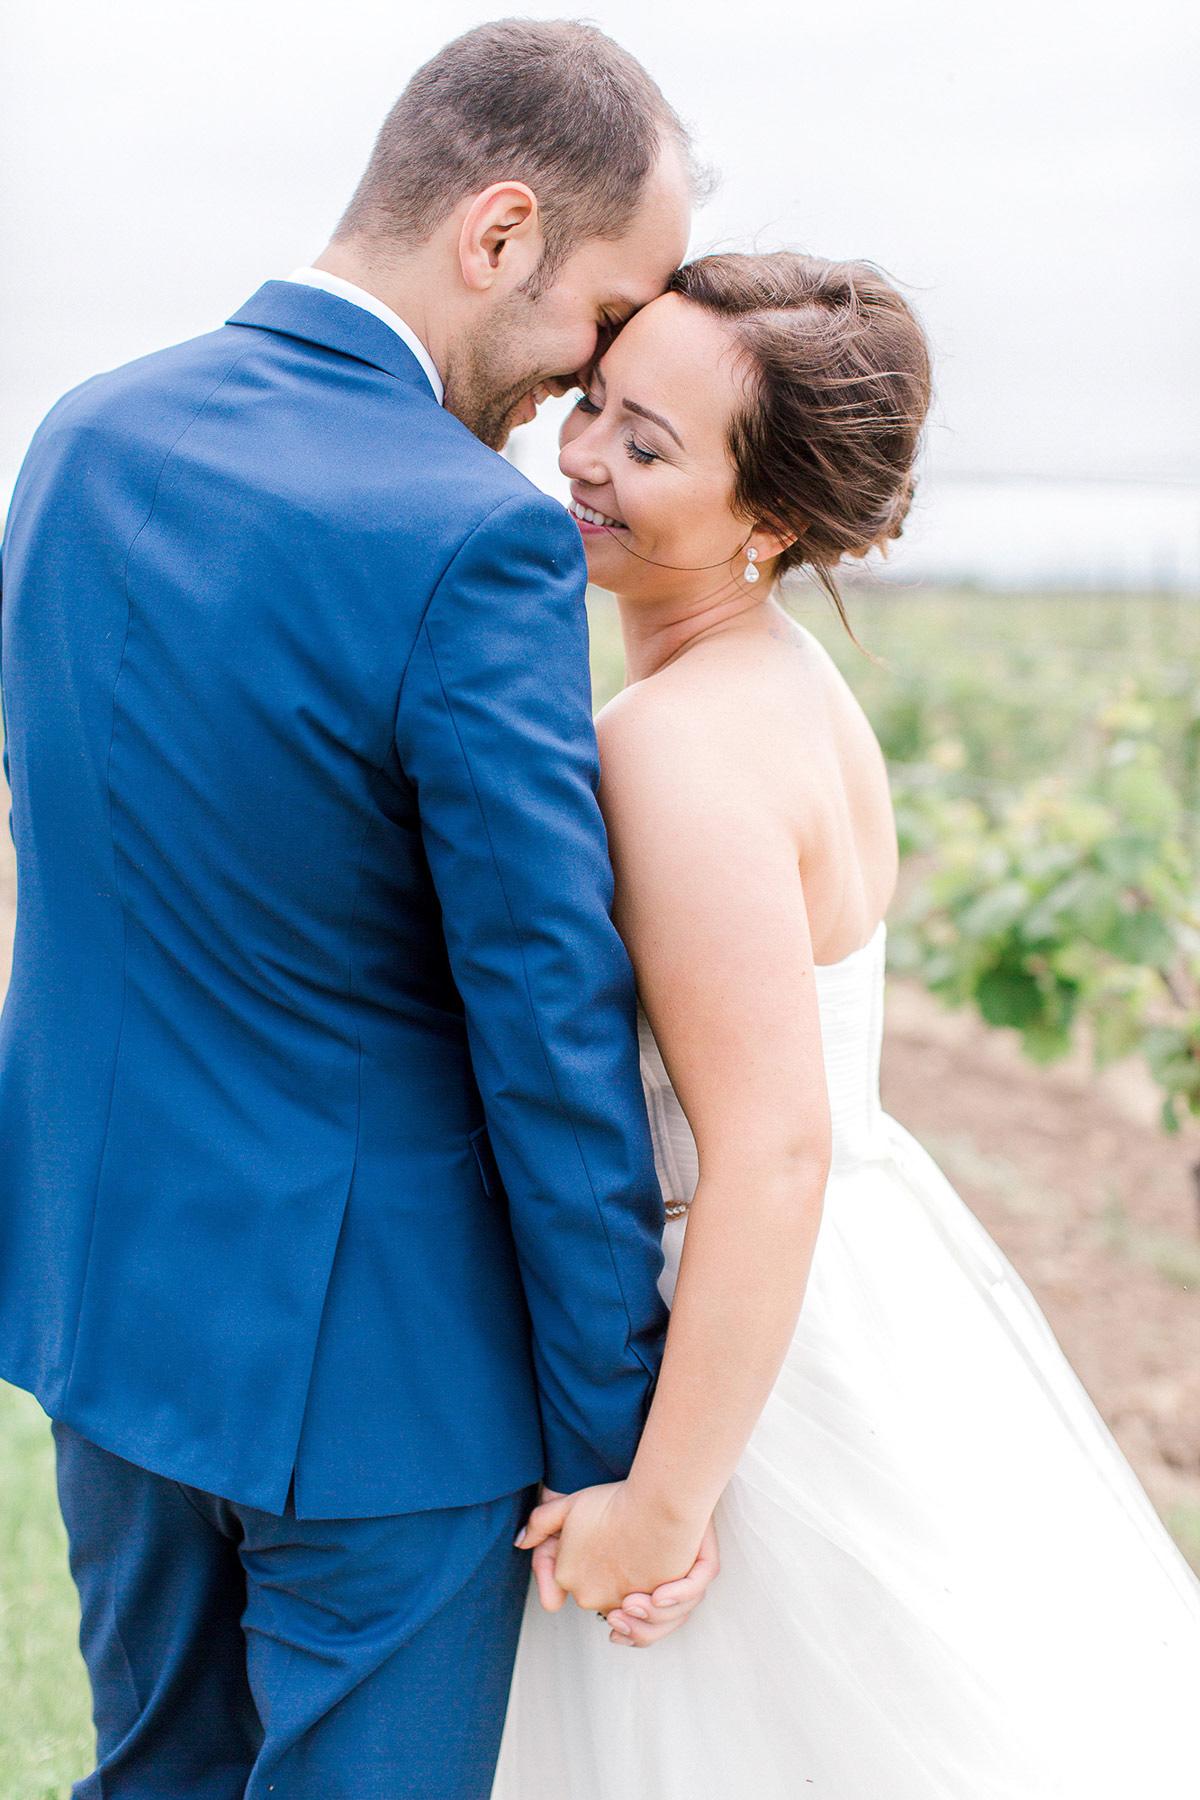 beatrice-elford-photography-vineyard-bride-swish-list-balls-falls-vineland-wedding-23.jpg